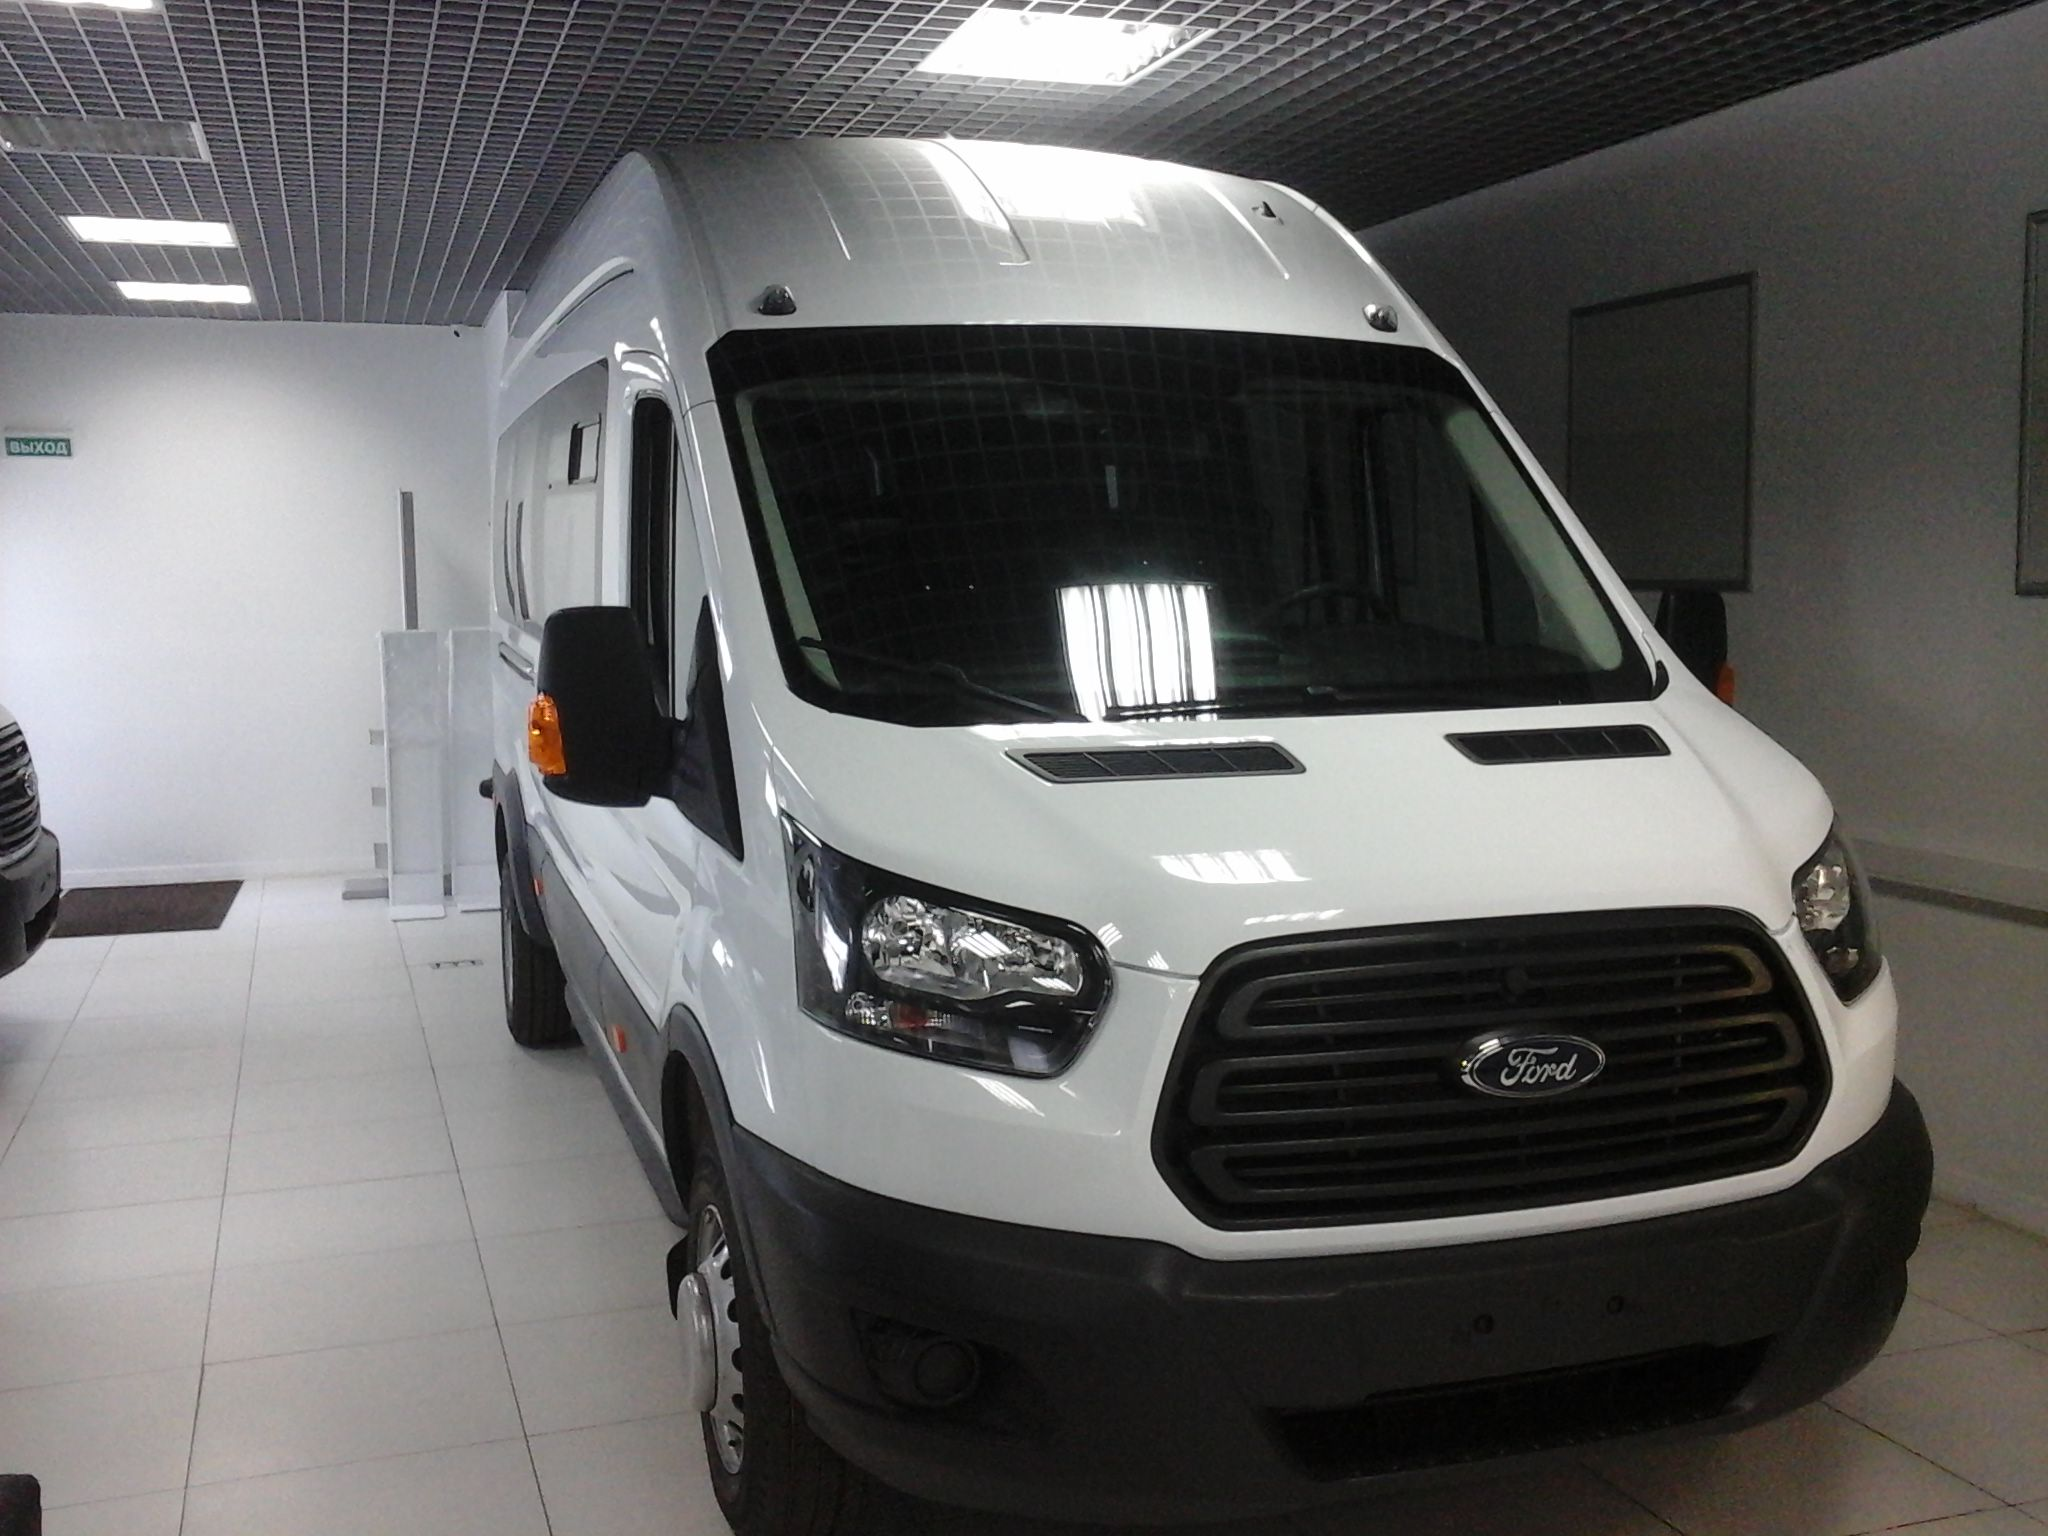 Ford Transit (17+1) туристический микроавтобус